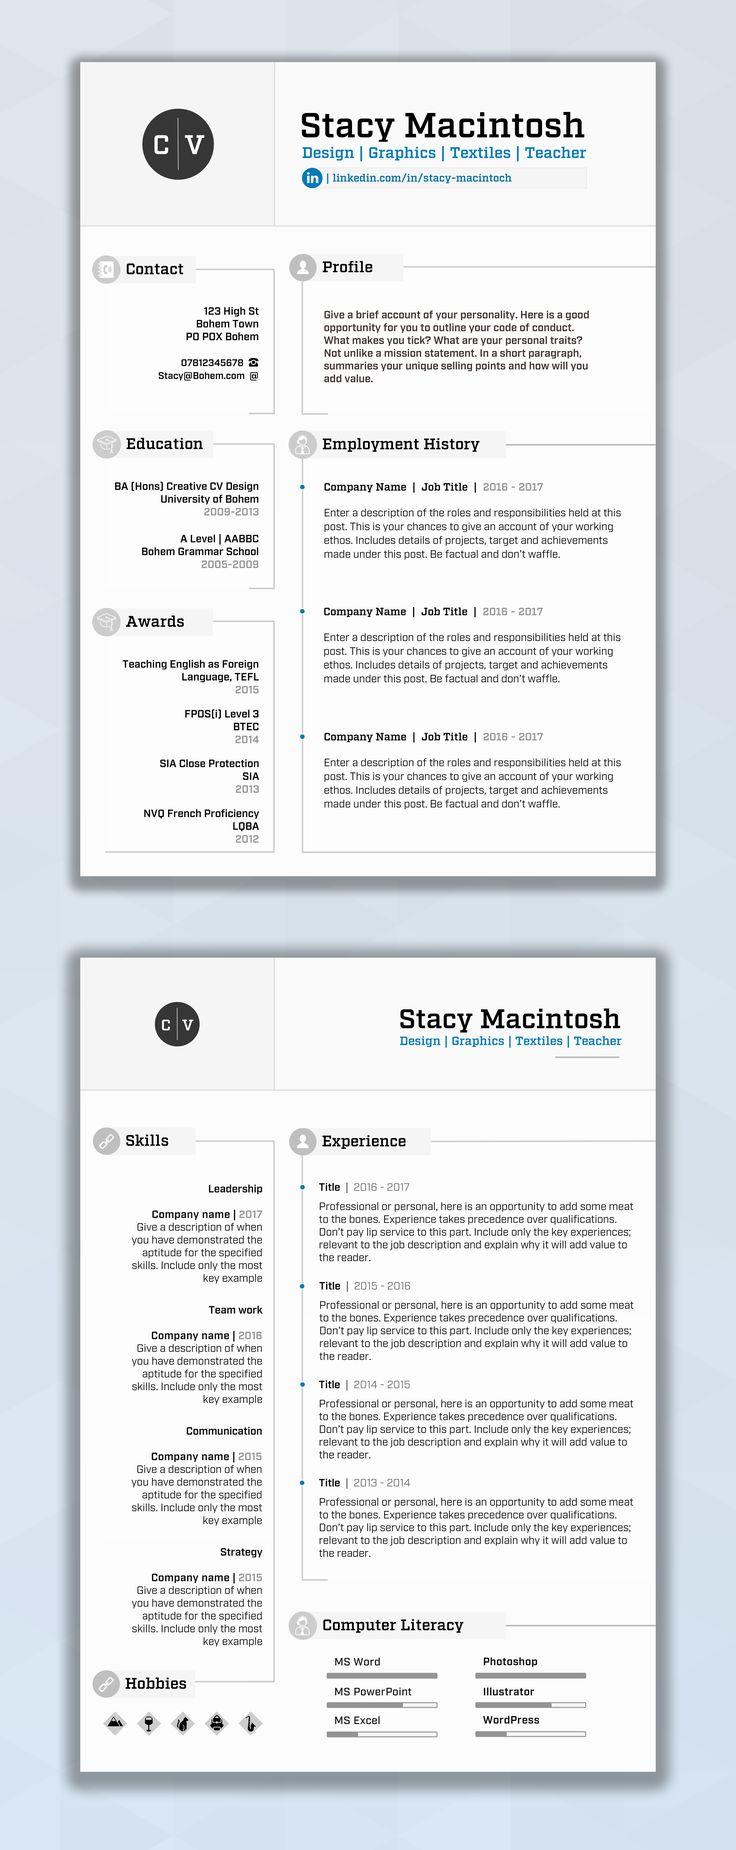 epub word template design 17 ideas about word template design report design